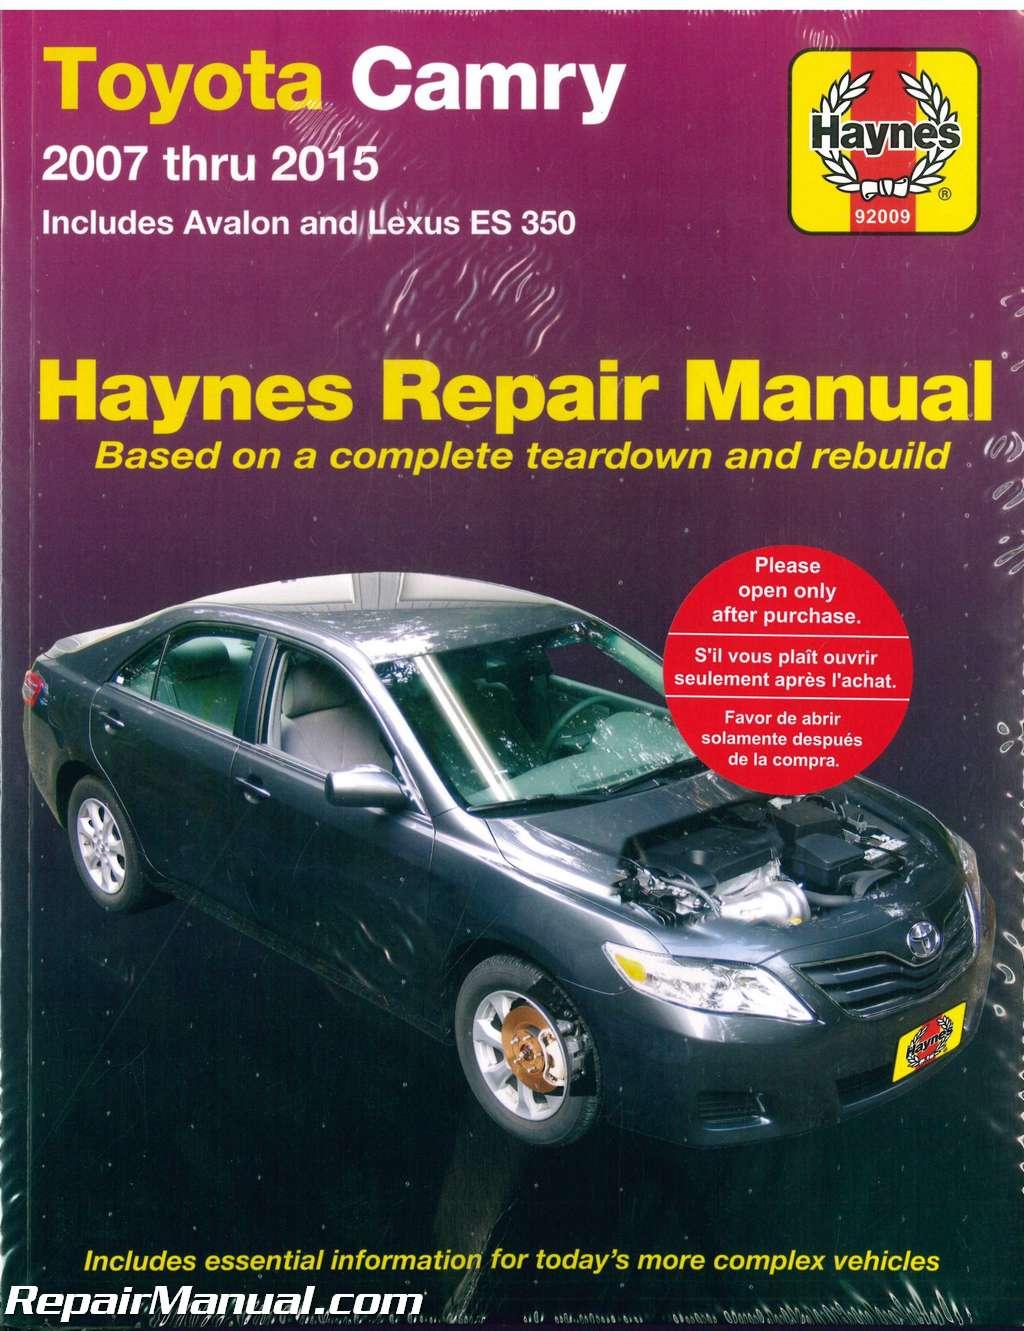 service manual pdf 2007 toyota camry collision repair toyota camry avalon lexus es 350 2007. Black Bedroom Furniture Sets. Home Design Ideas